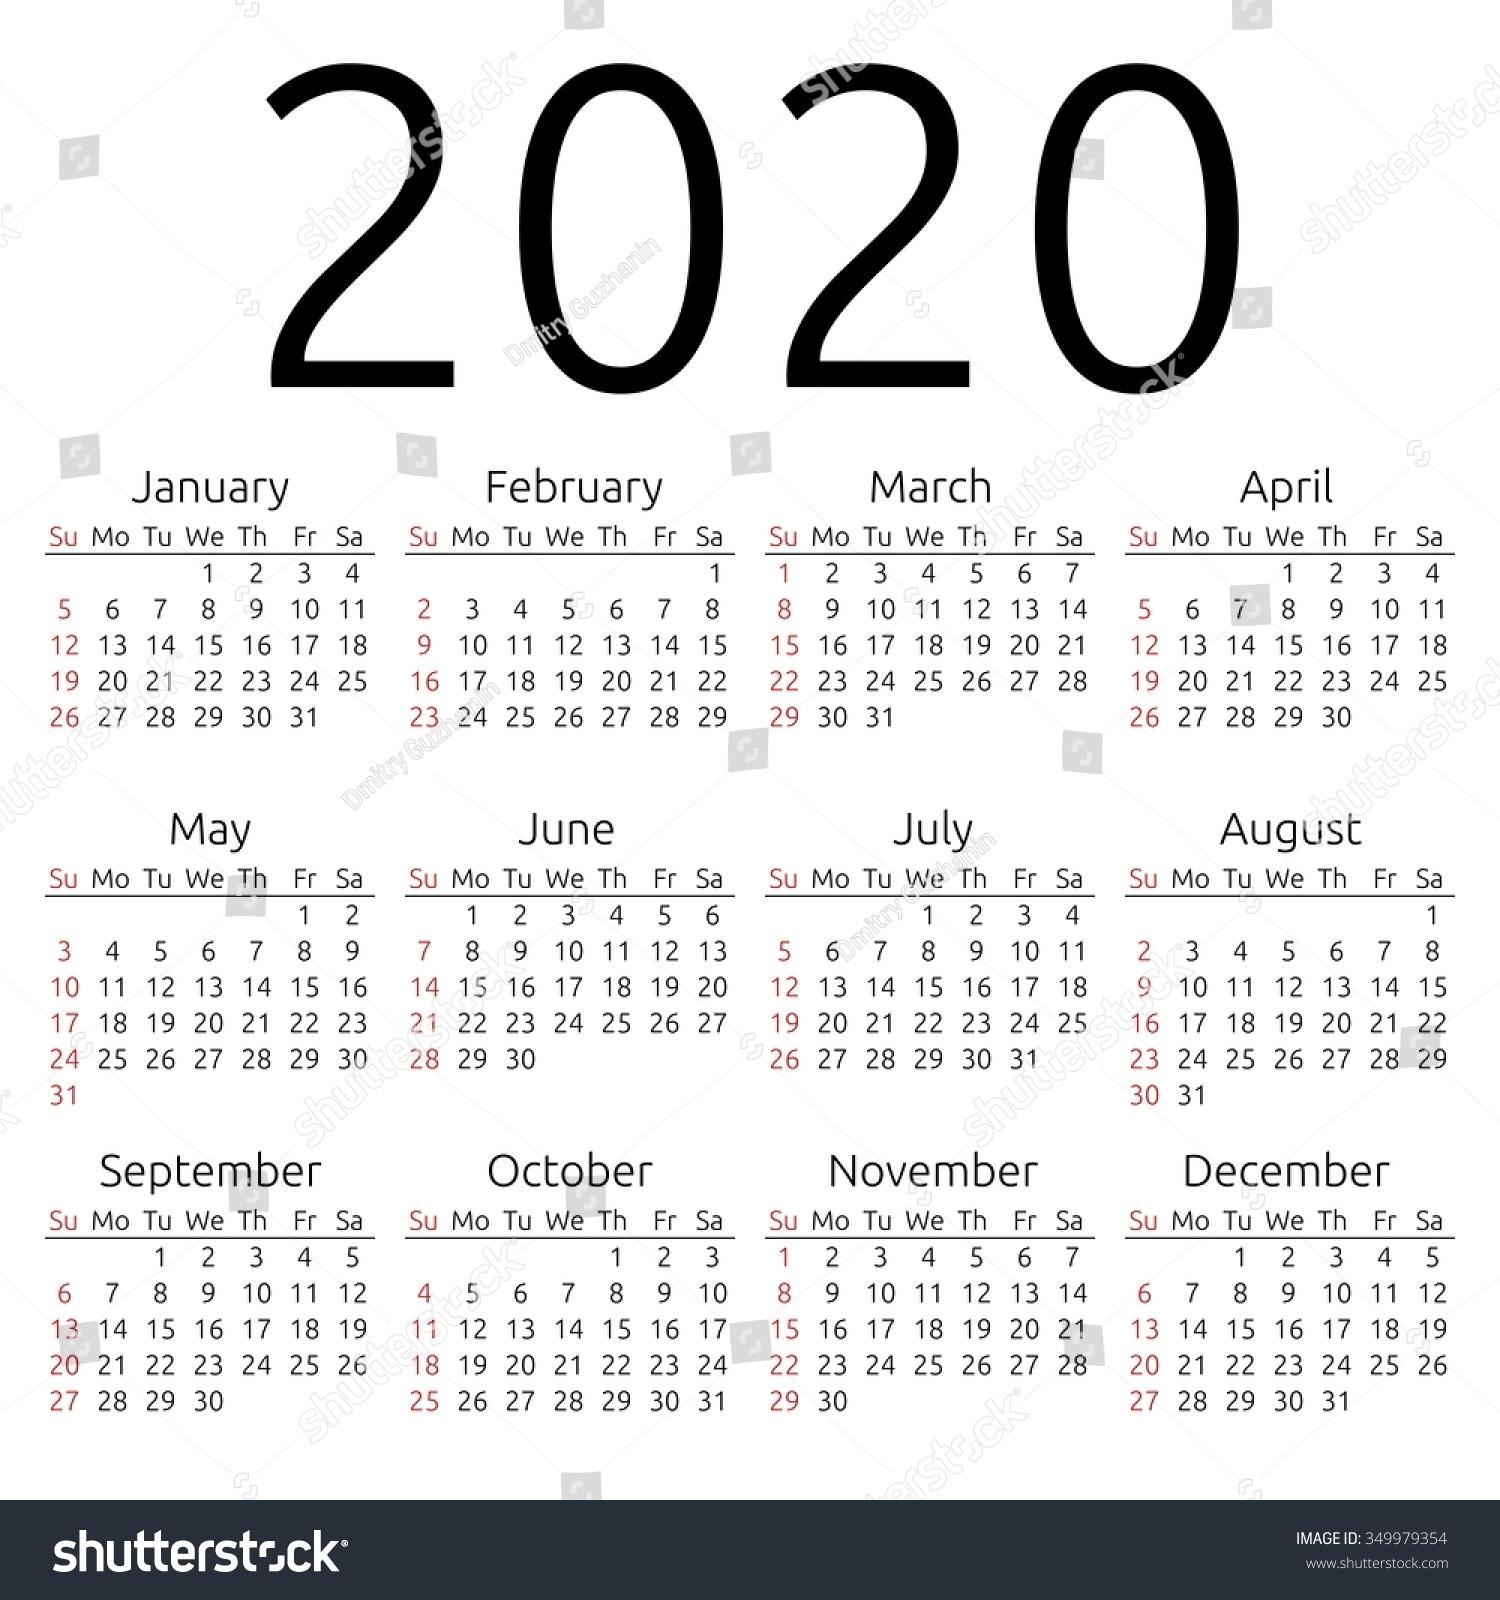 Календарь 2020 С Номерами Недель - Bagno.site regarding 2020 Calendar By Month And Week Number Excel